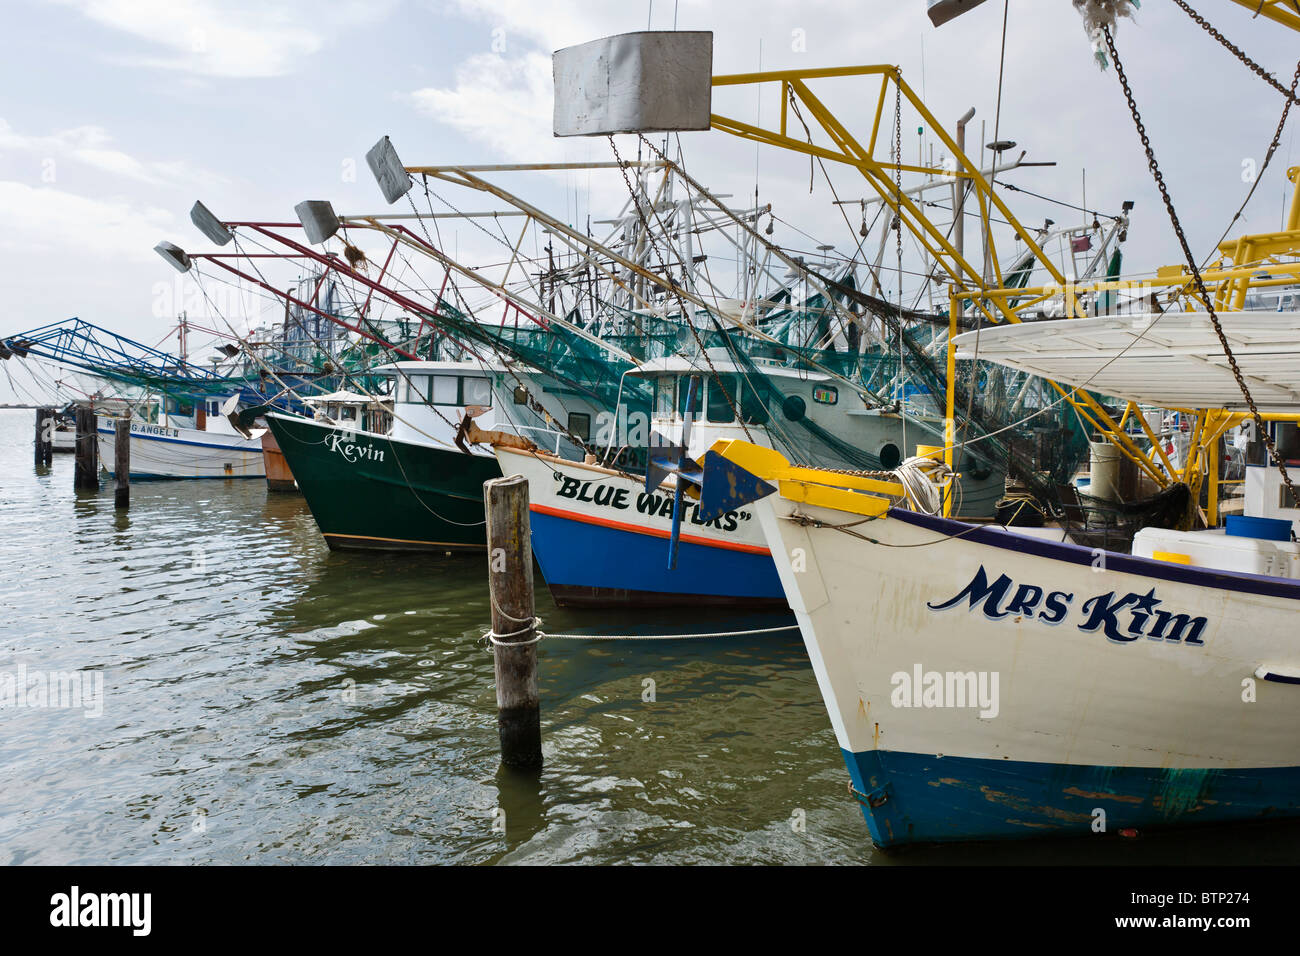 Shrimp boats in the harbor at Biloxi, Gulf Coast, Mississippi, USA - Stock Image